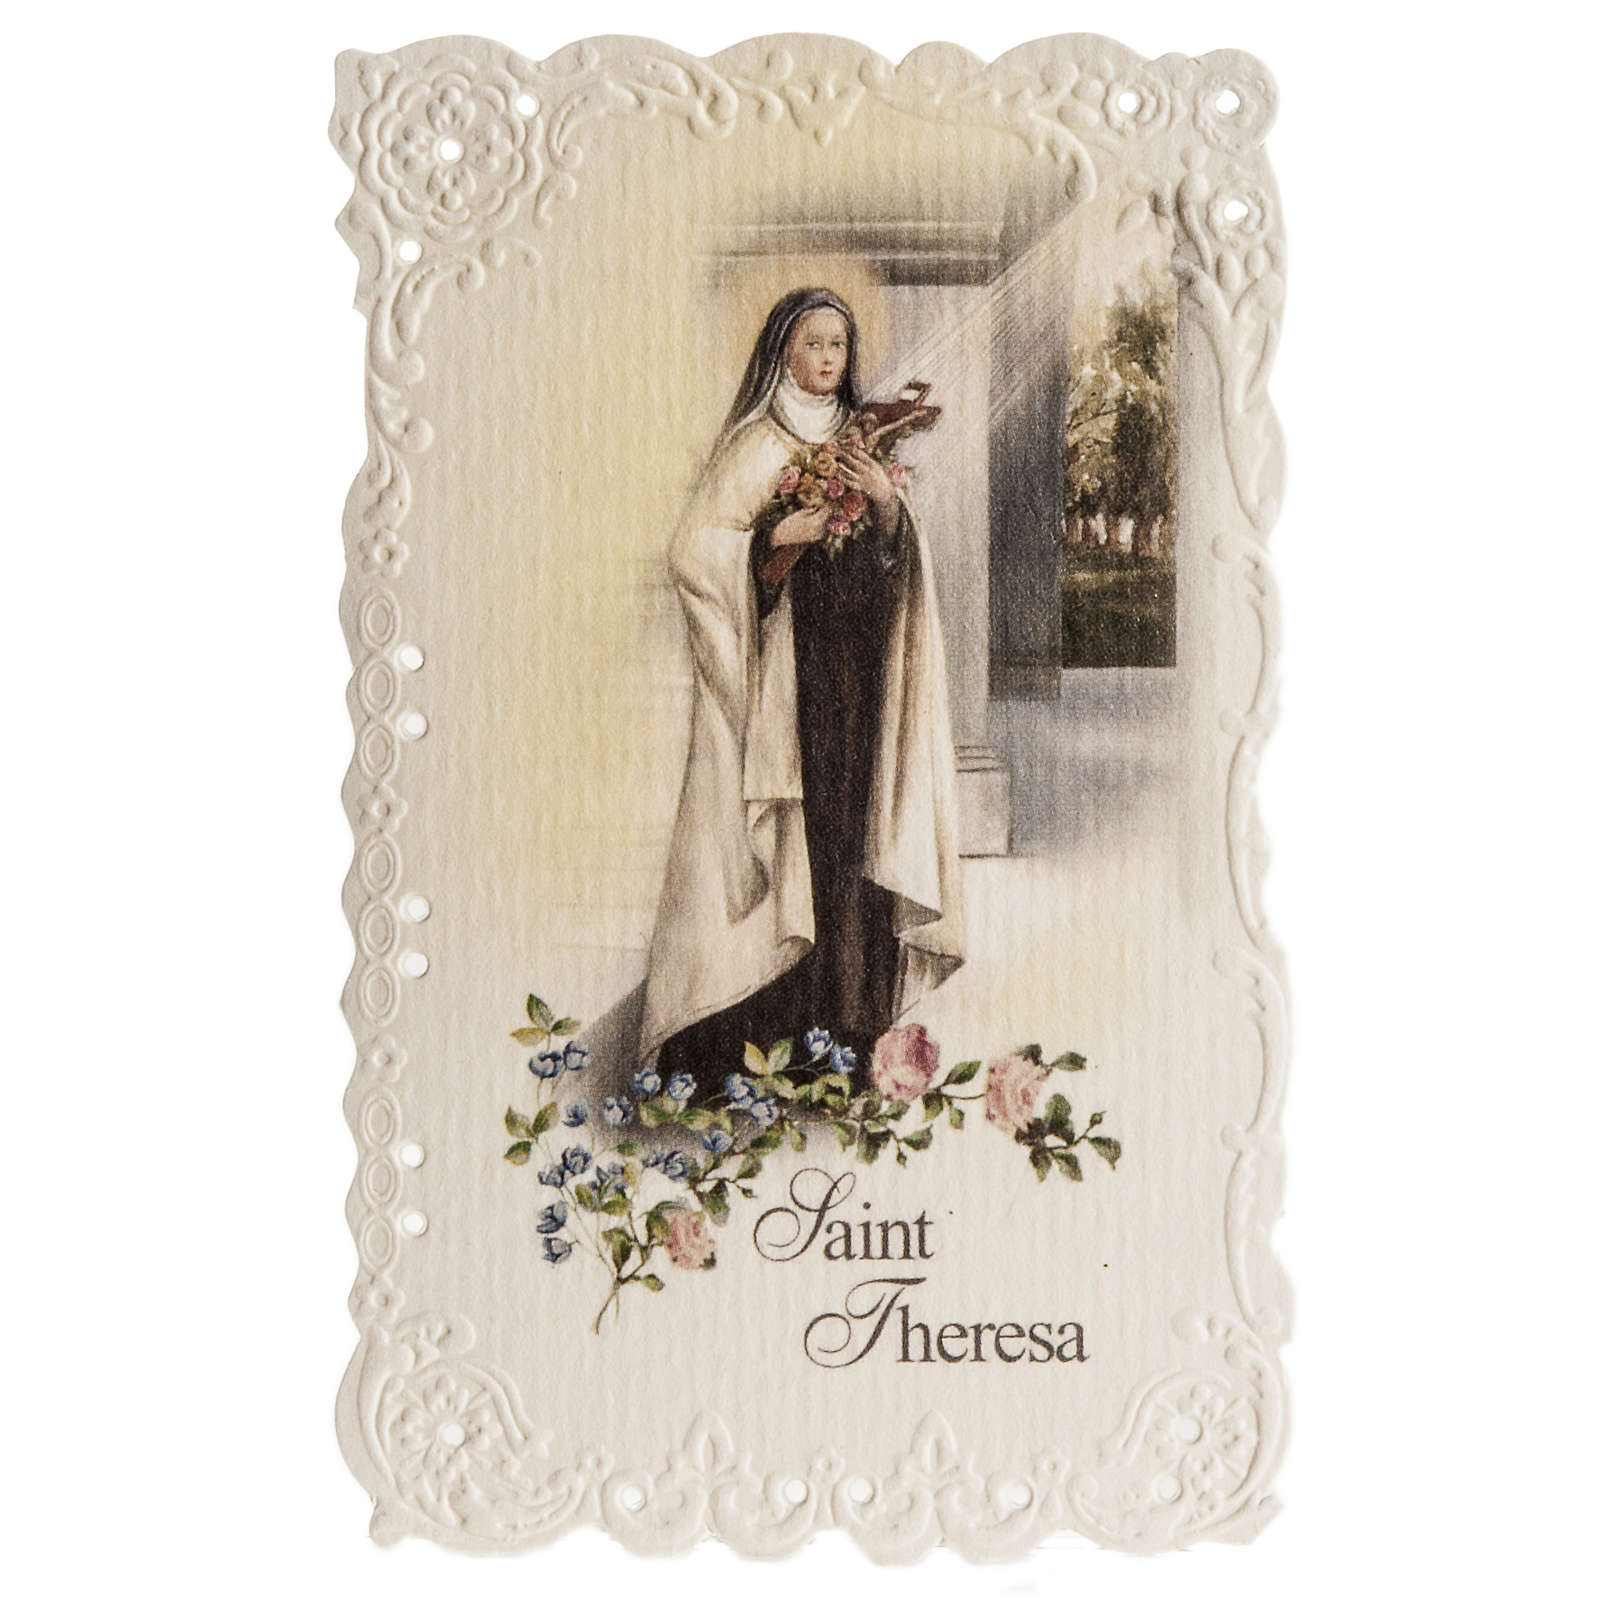 Santino Saint Theresa con preghiera (inglese) 4